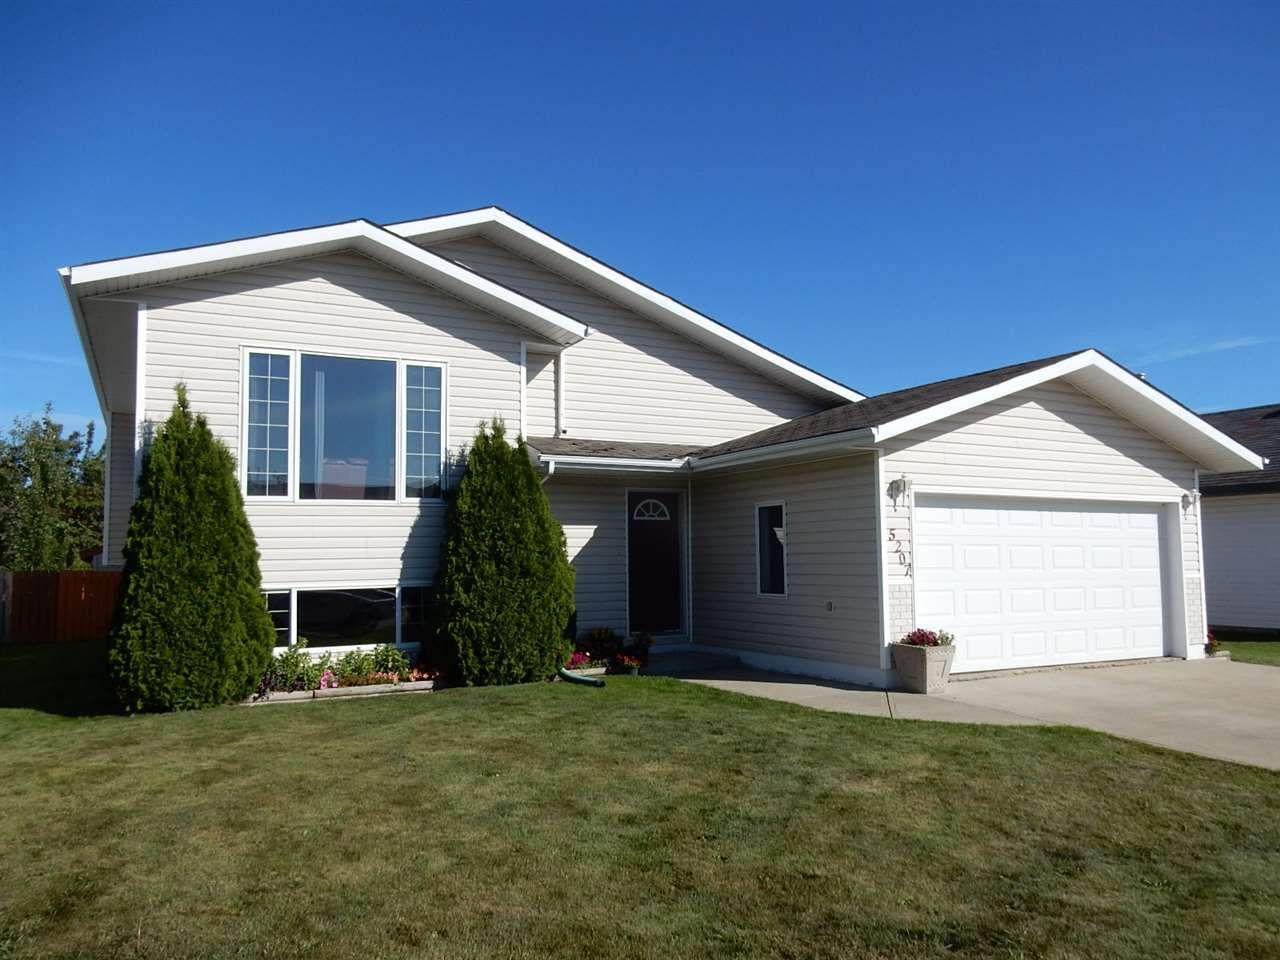 Main Photo: 5207 52A Street: Legal House for sale : MLS®# E4150172